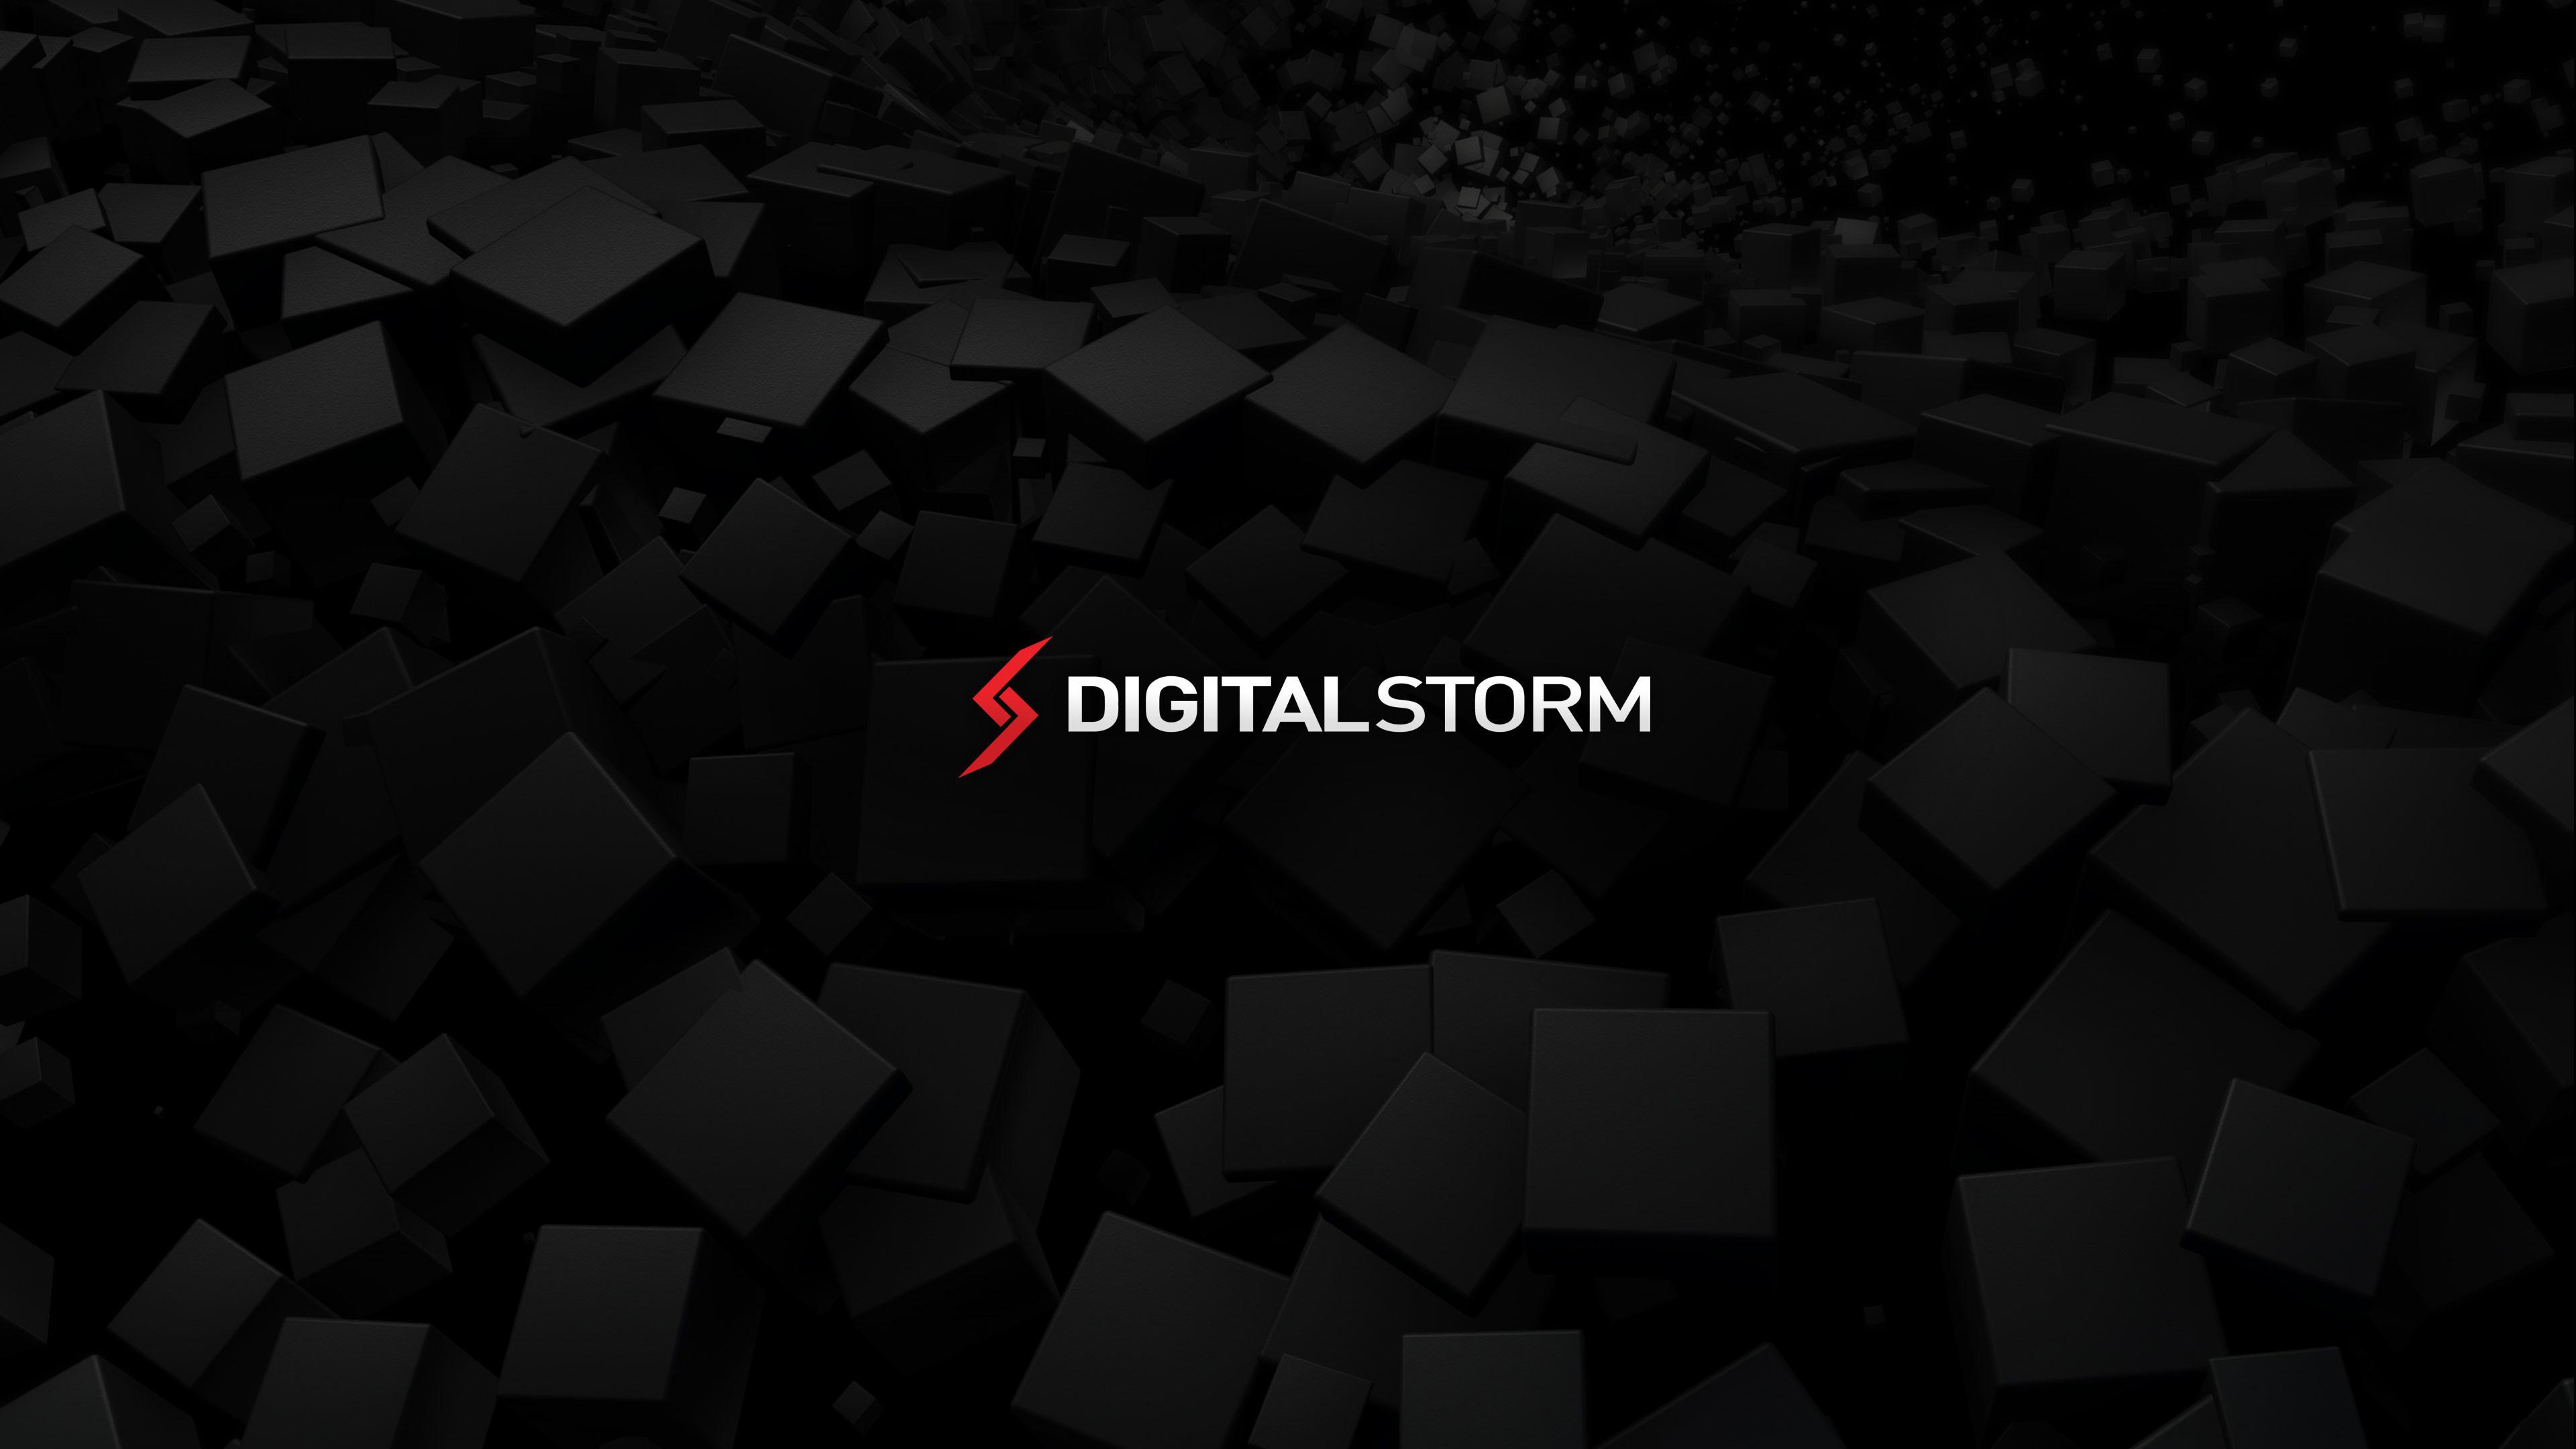 f. Digital Storm Black Hole Wallpaper